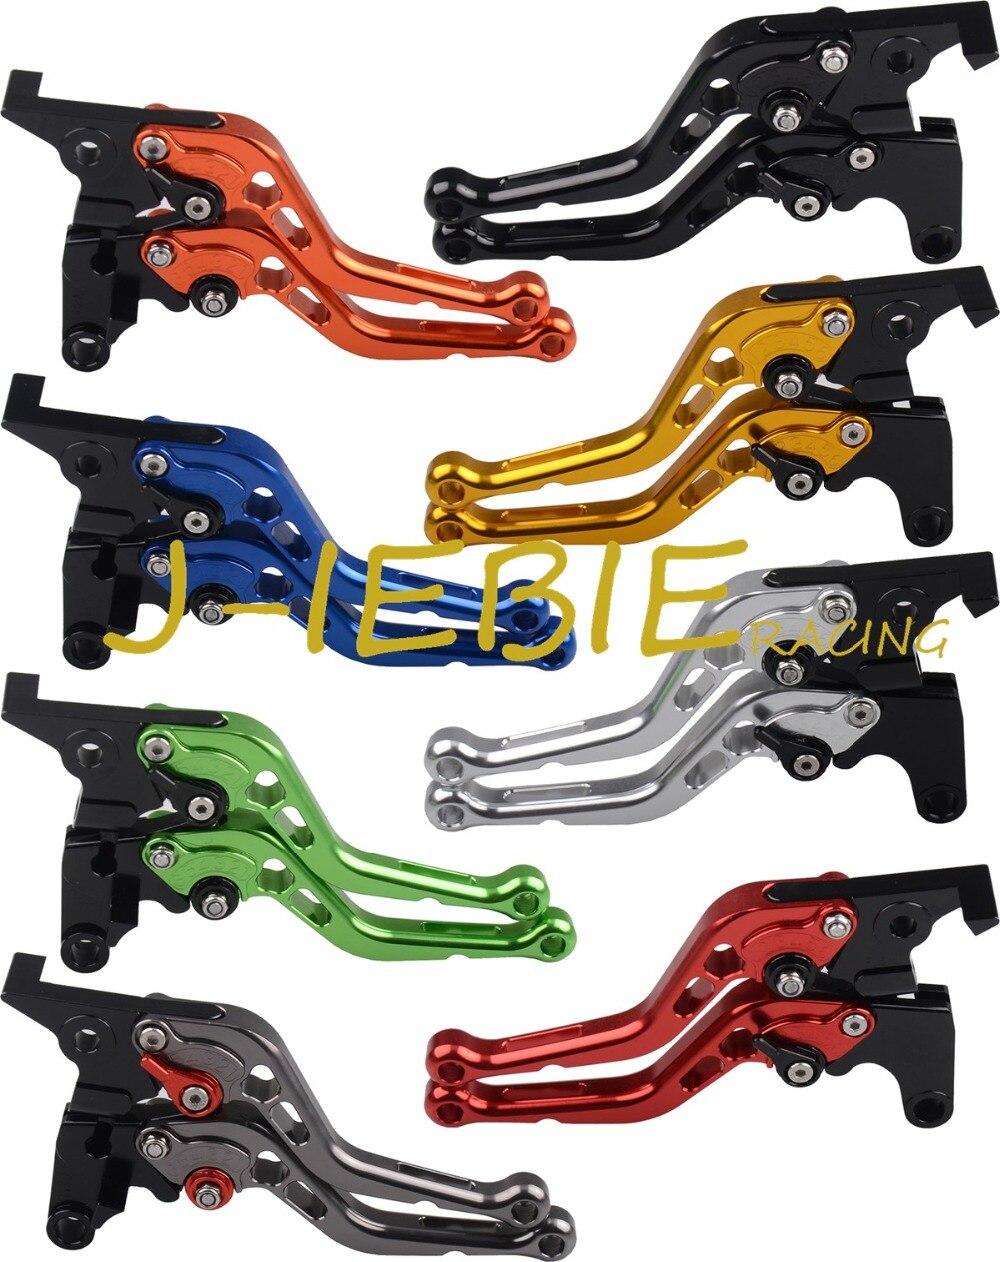 For Yamaha MT-01 2004-2009 V-MAX 2009-2016 157 New